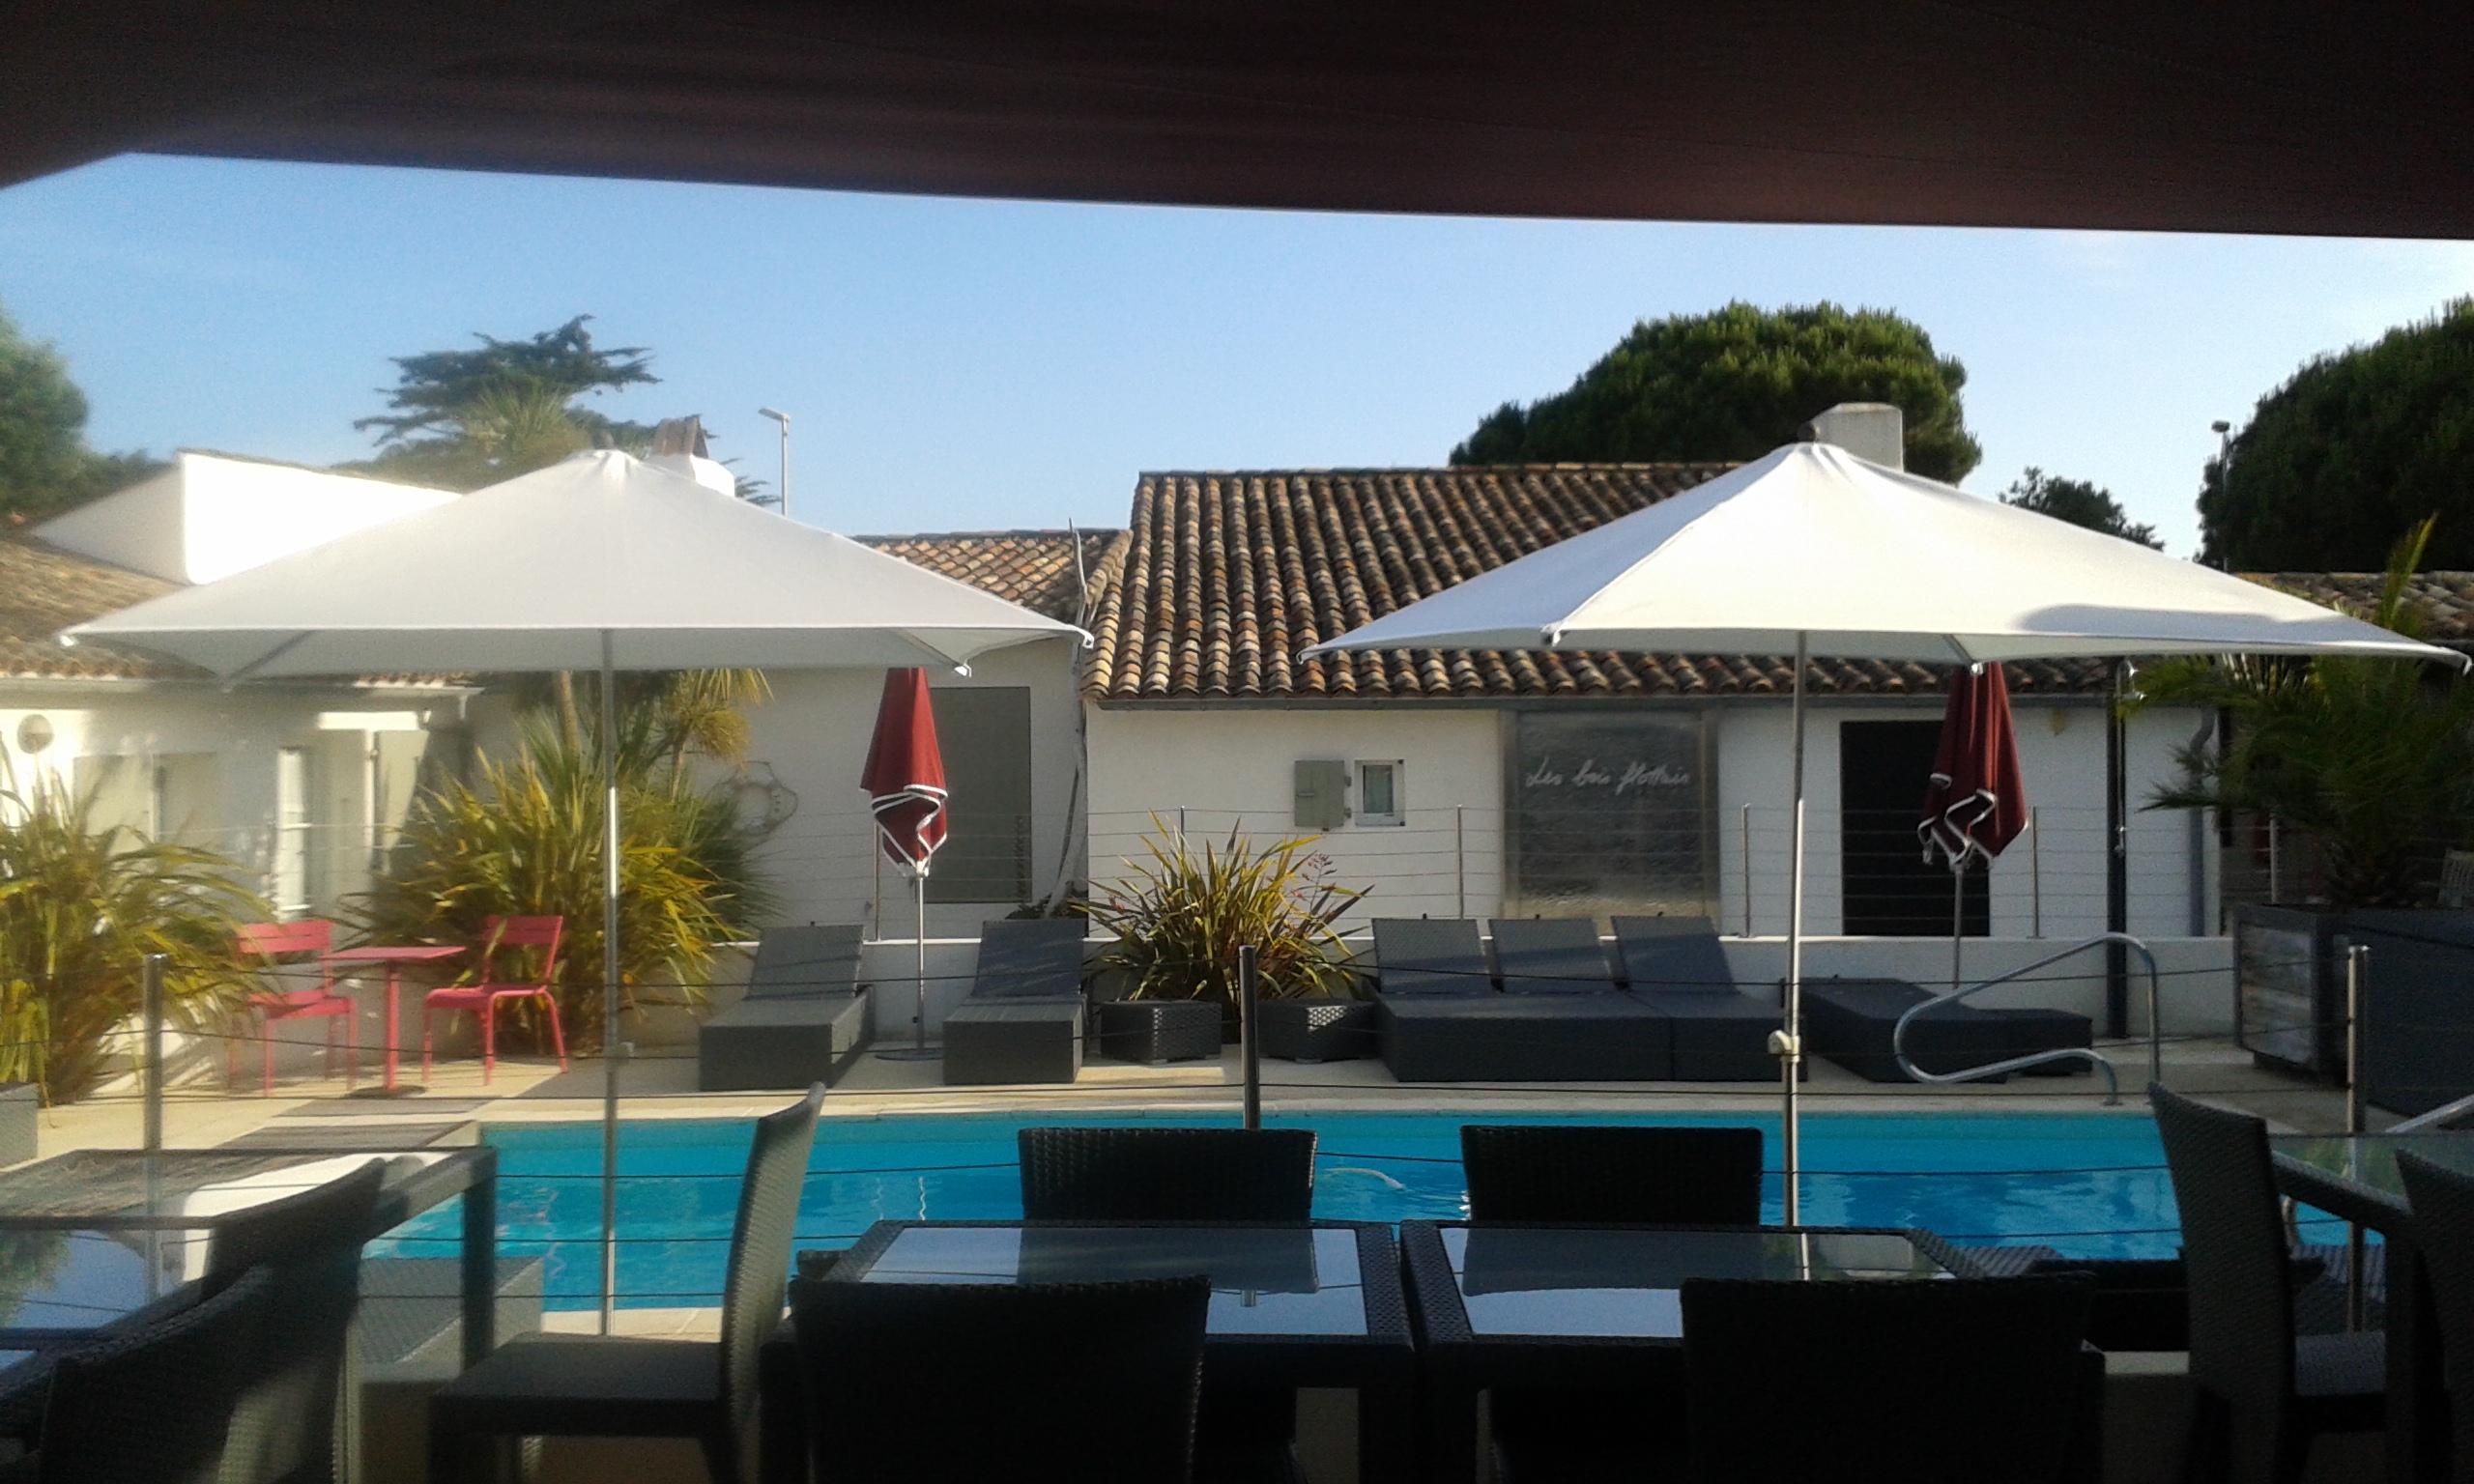 HOTEL LES BOIS FLOTTAIS # Hotel Les Bois Flottais